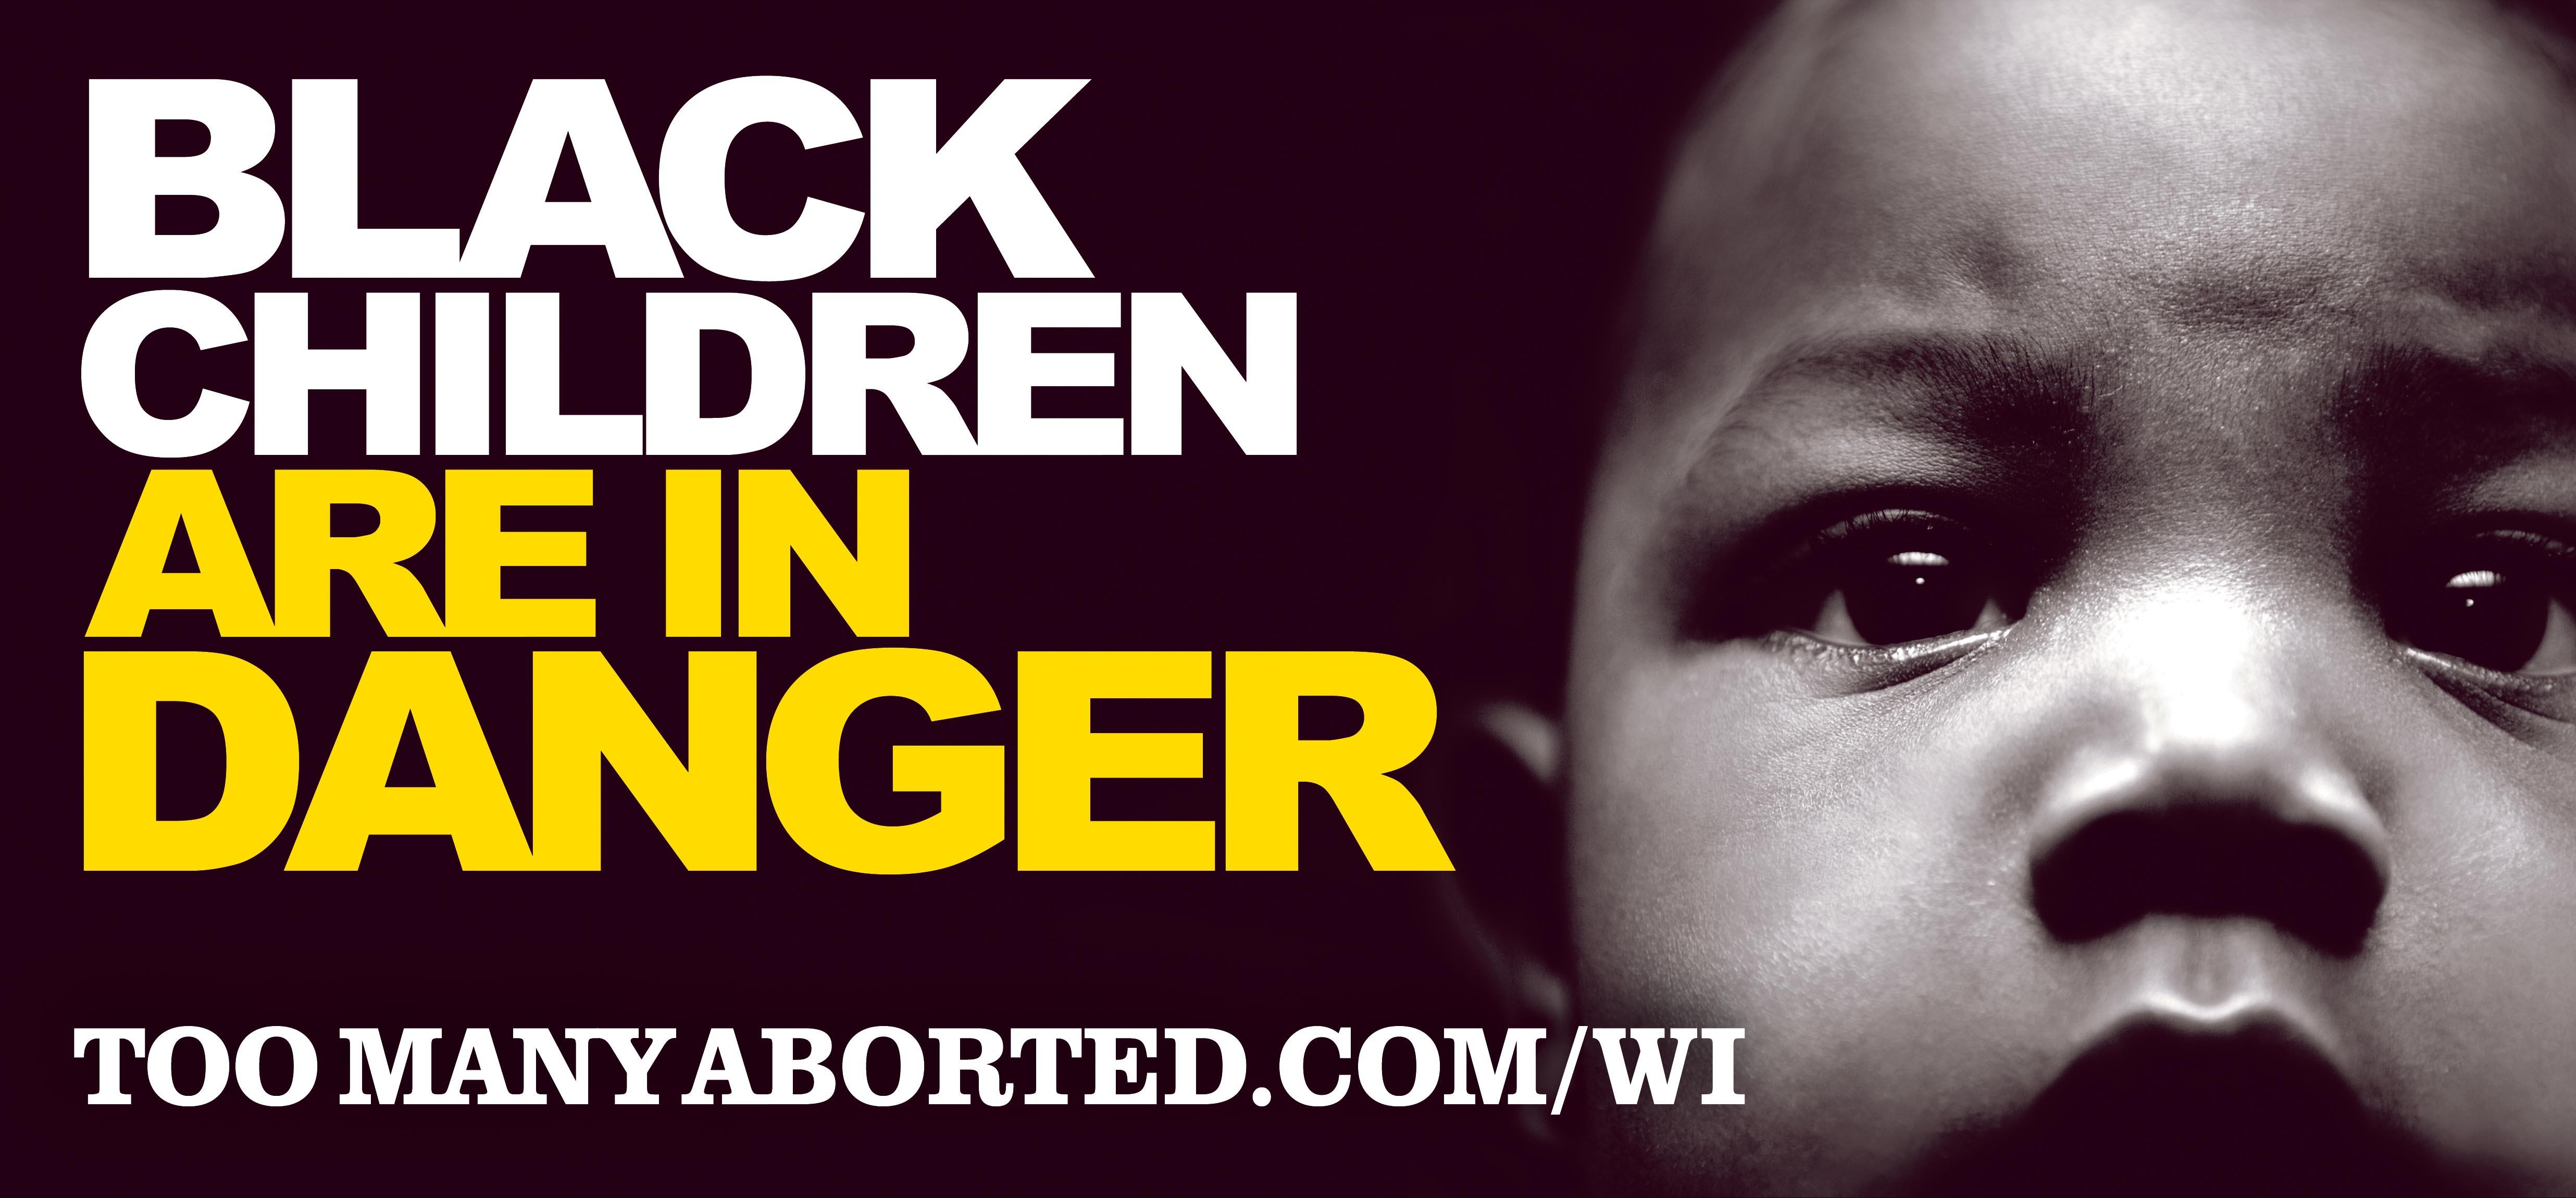 Black Children in Danger Billboard